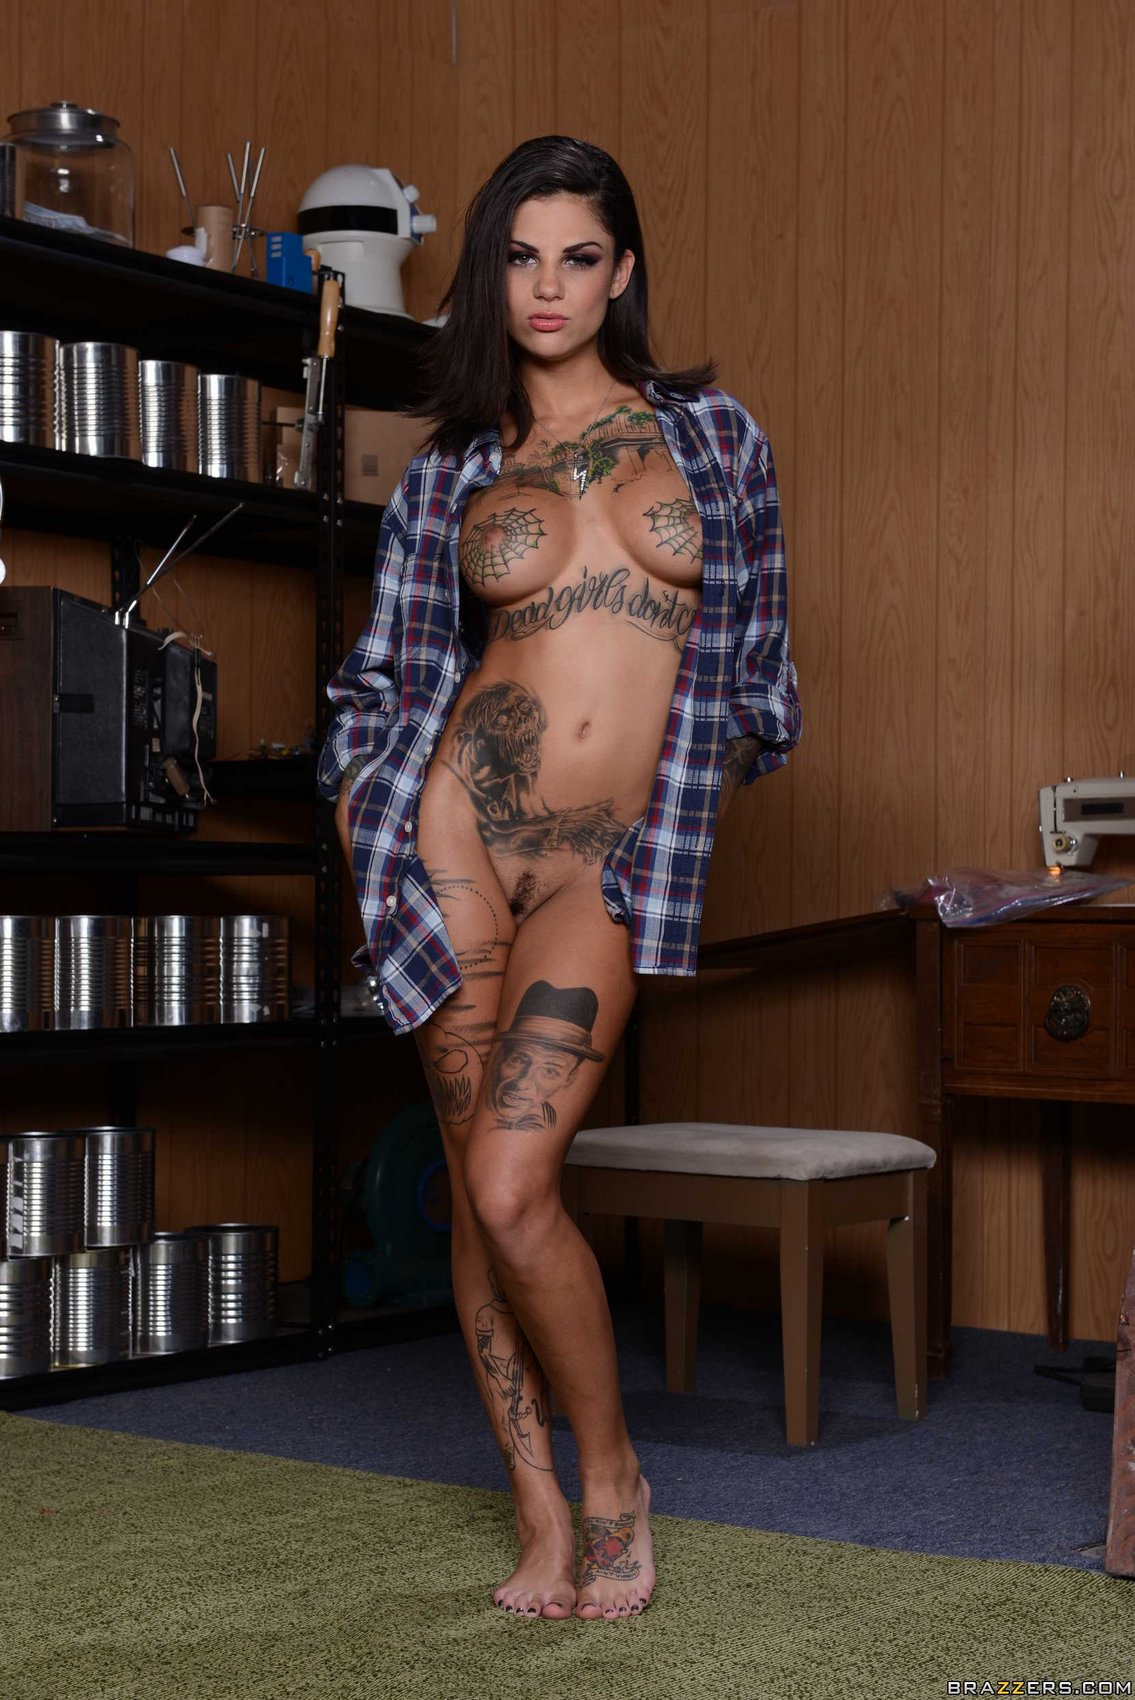 Bonnie Rotten showing off her sexy body - My Pornstar Book